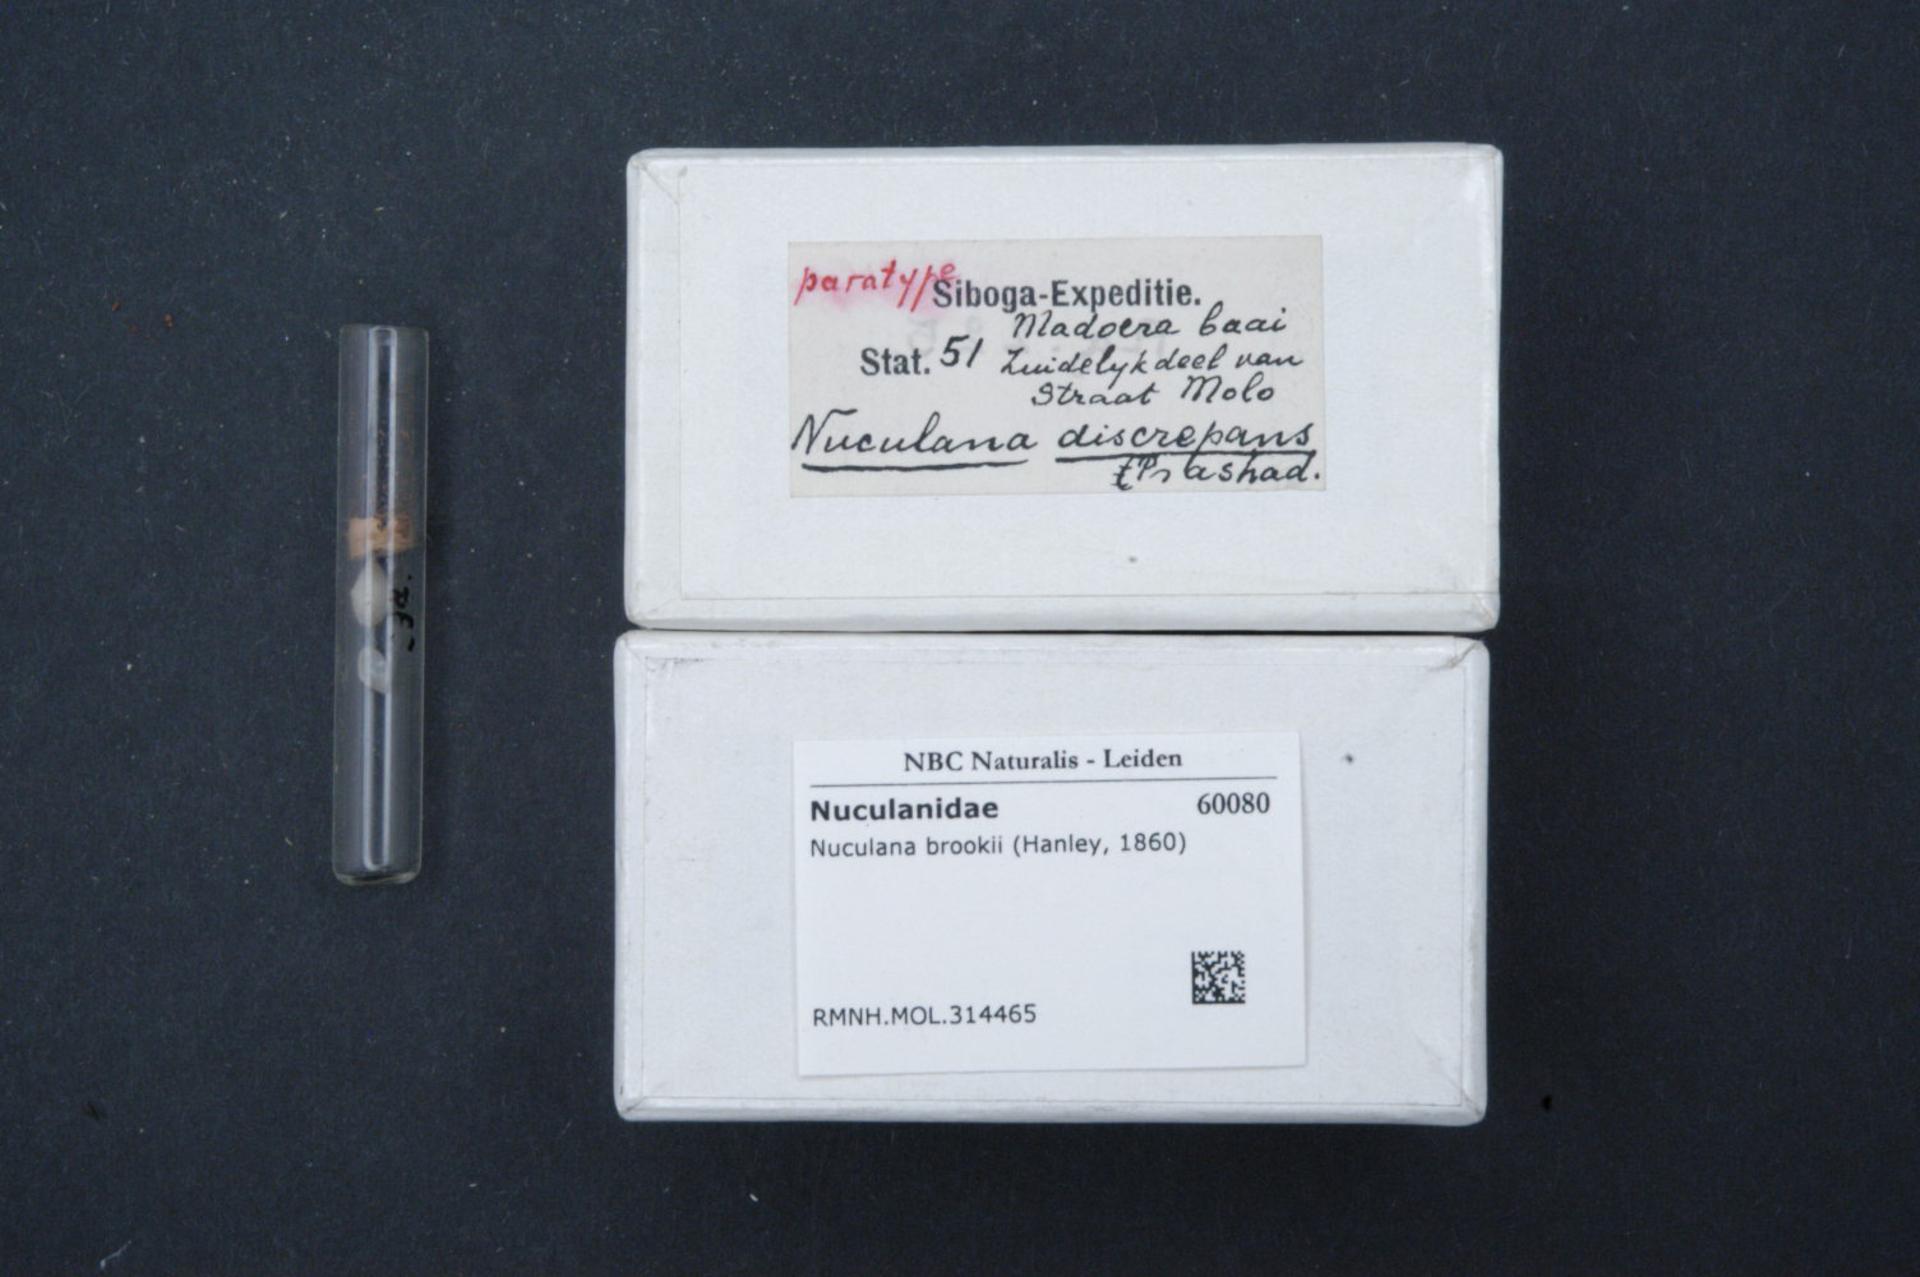 RMNH.MOL.314465   Nuculana (Ledella) discrepans Prashad, 1932